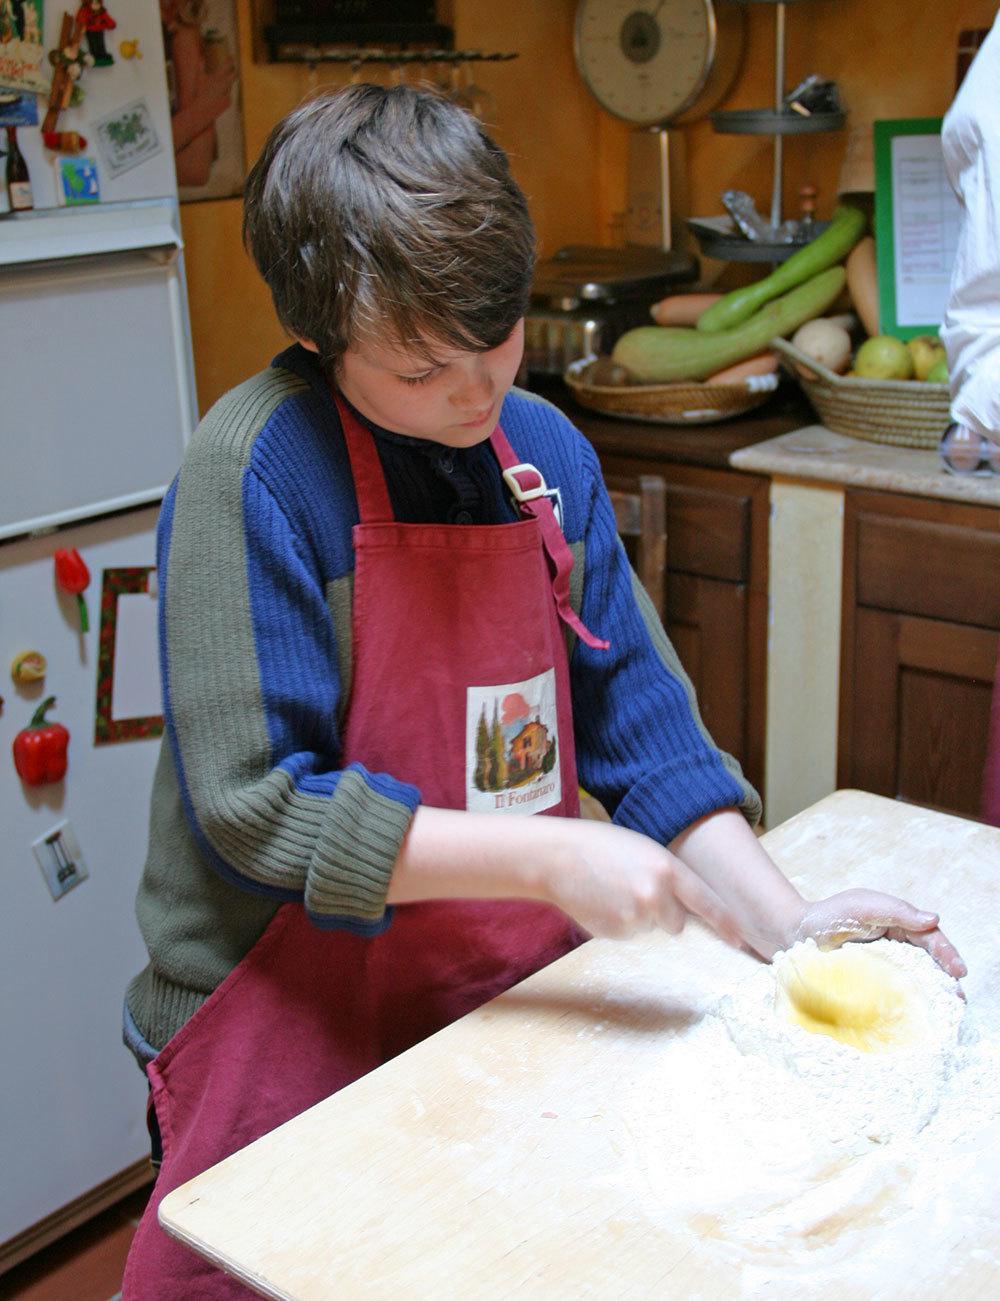 Our son Kristian making pasta.